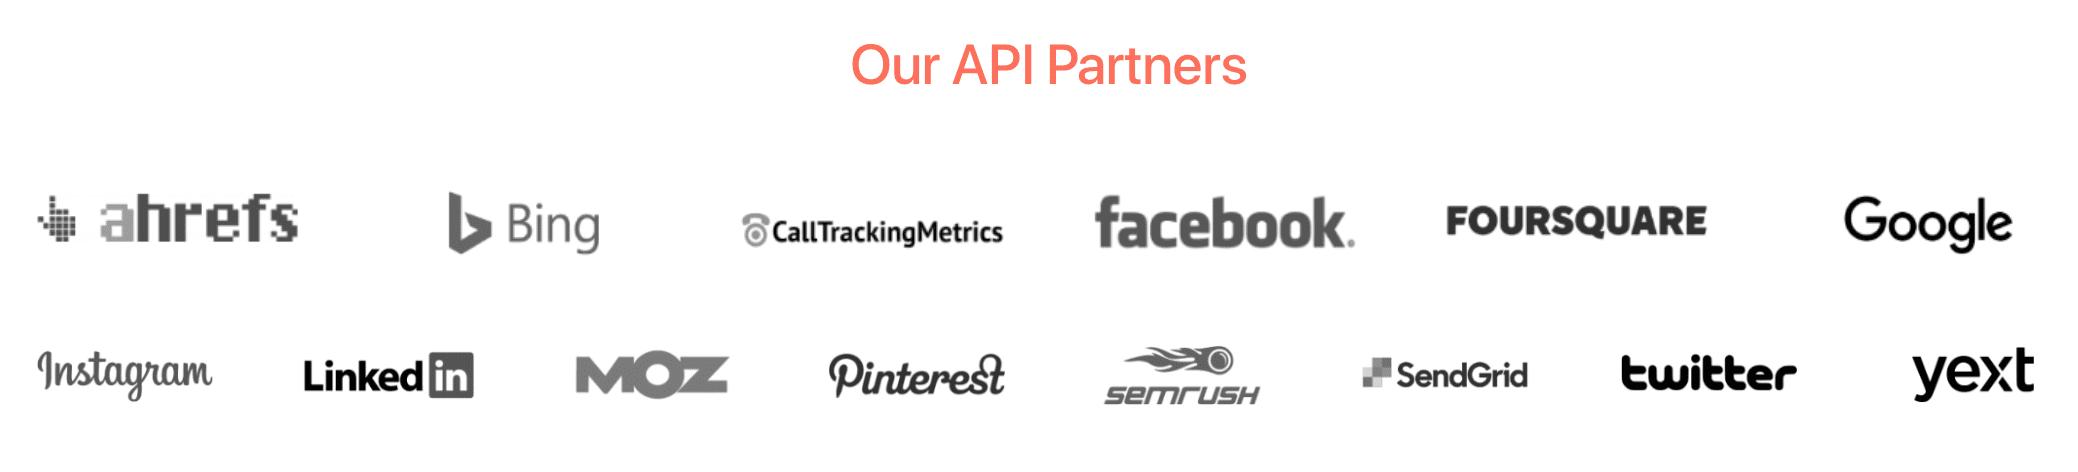 API-Partner-Logos